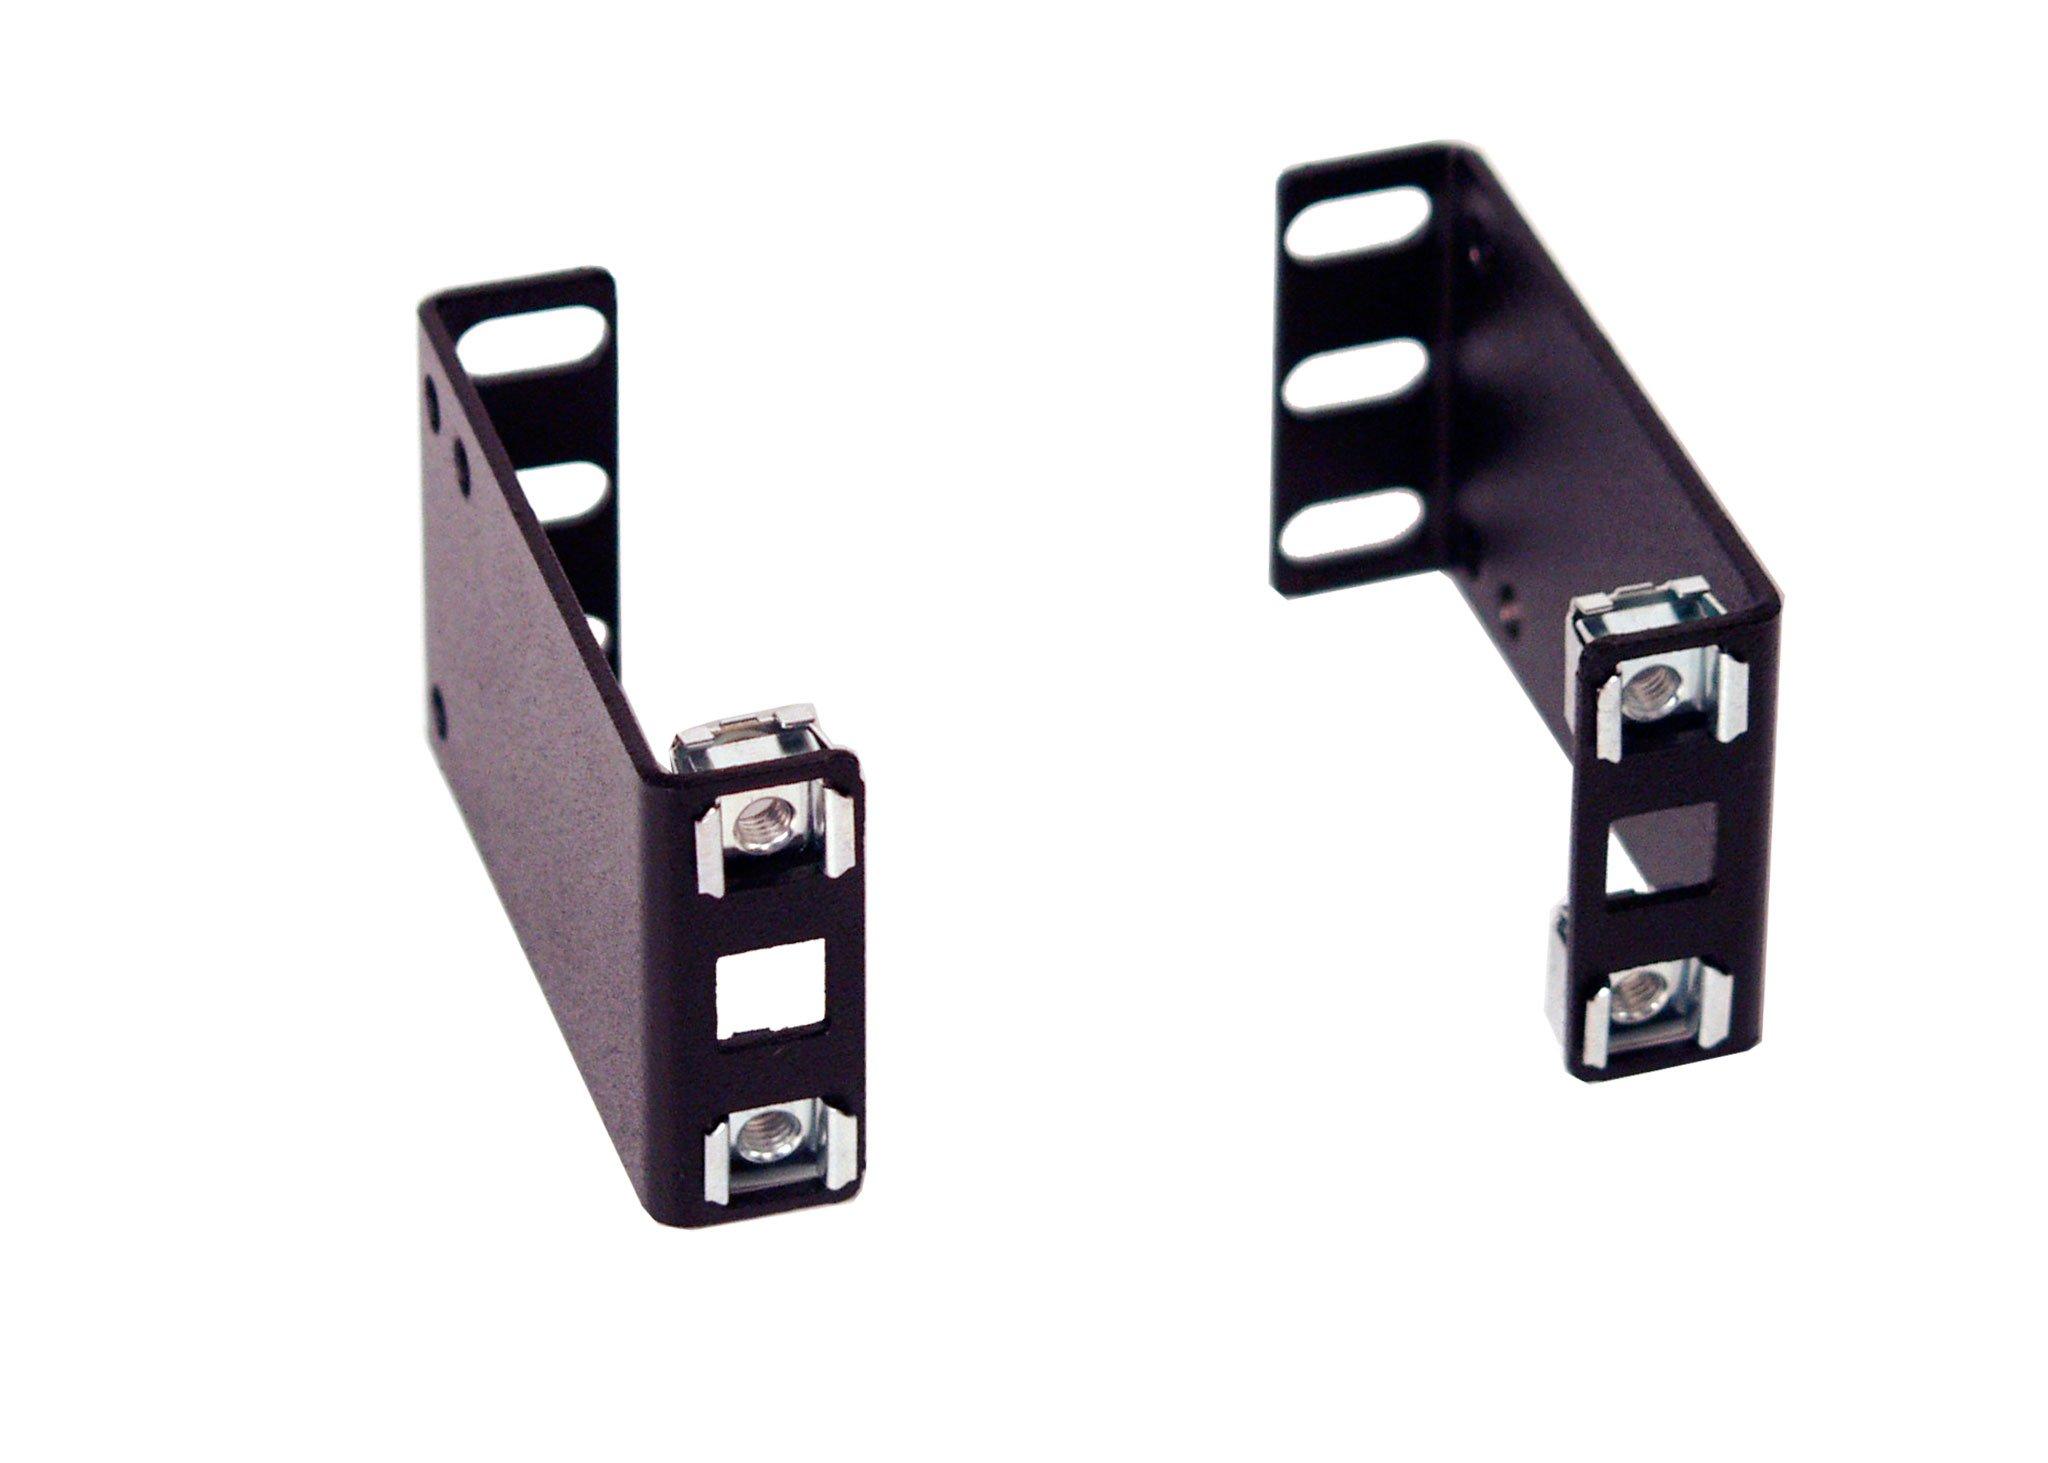 IAB103V10-1U 1U 3 inch Rack Extender for Industrial Standard 19 inch 2 Post Relay Rack or 4 Post Rack Cabinet.